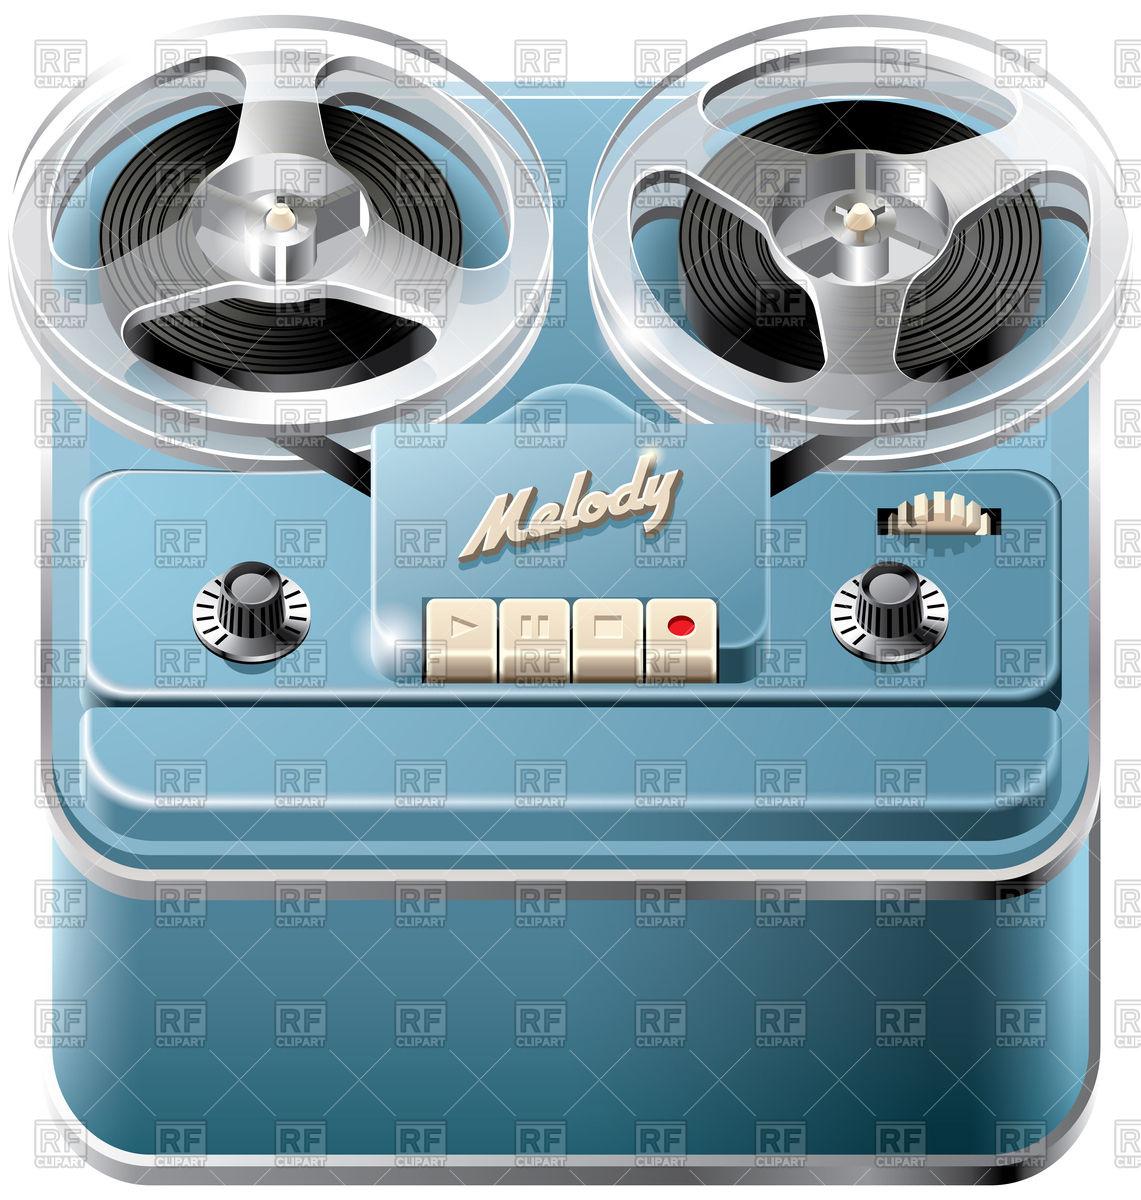 1141x1200 Vintage Reel To Reel Audio Tape Recorder Vector Image Vector